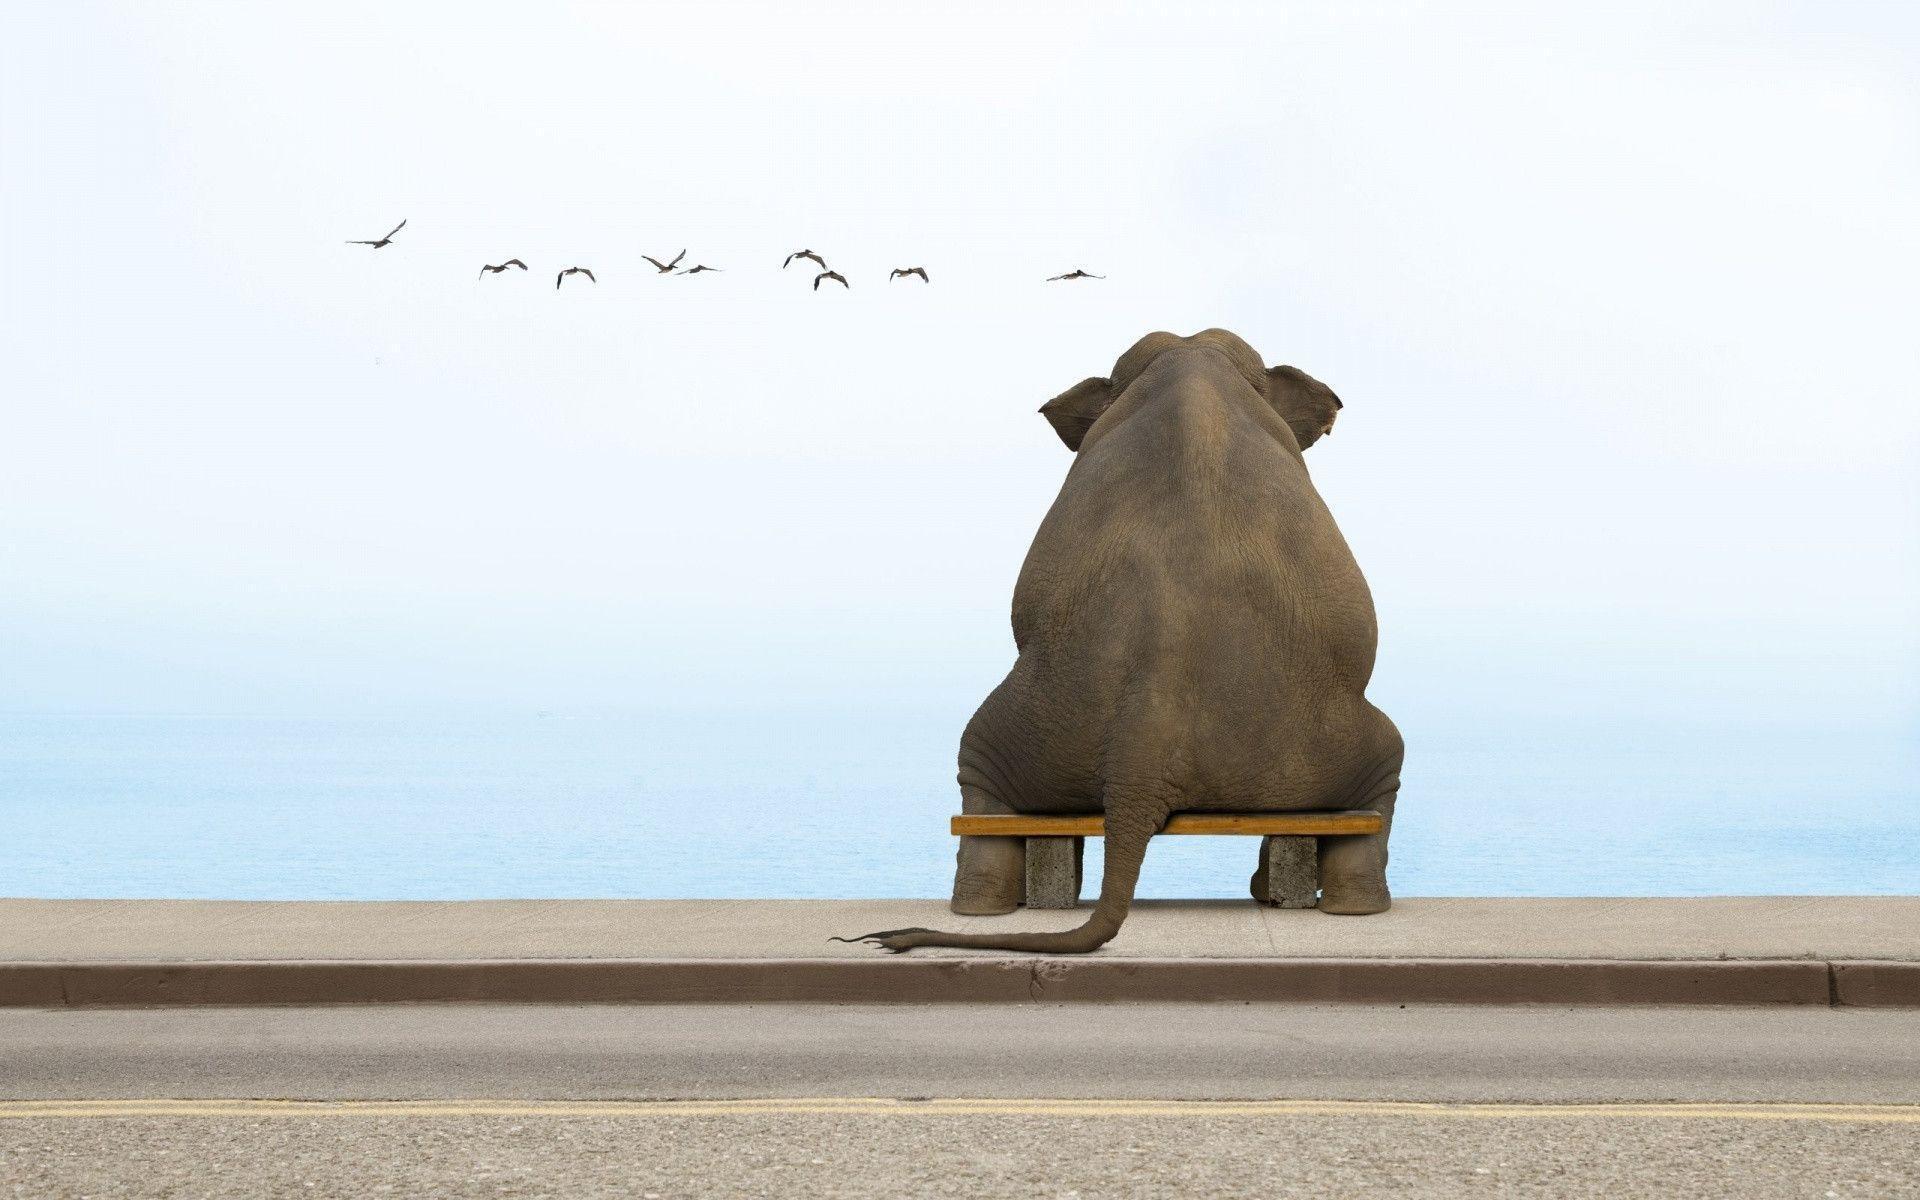 1920x1200 Sitting Elephant Wallpaper